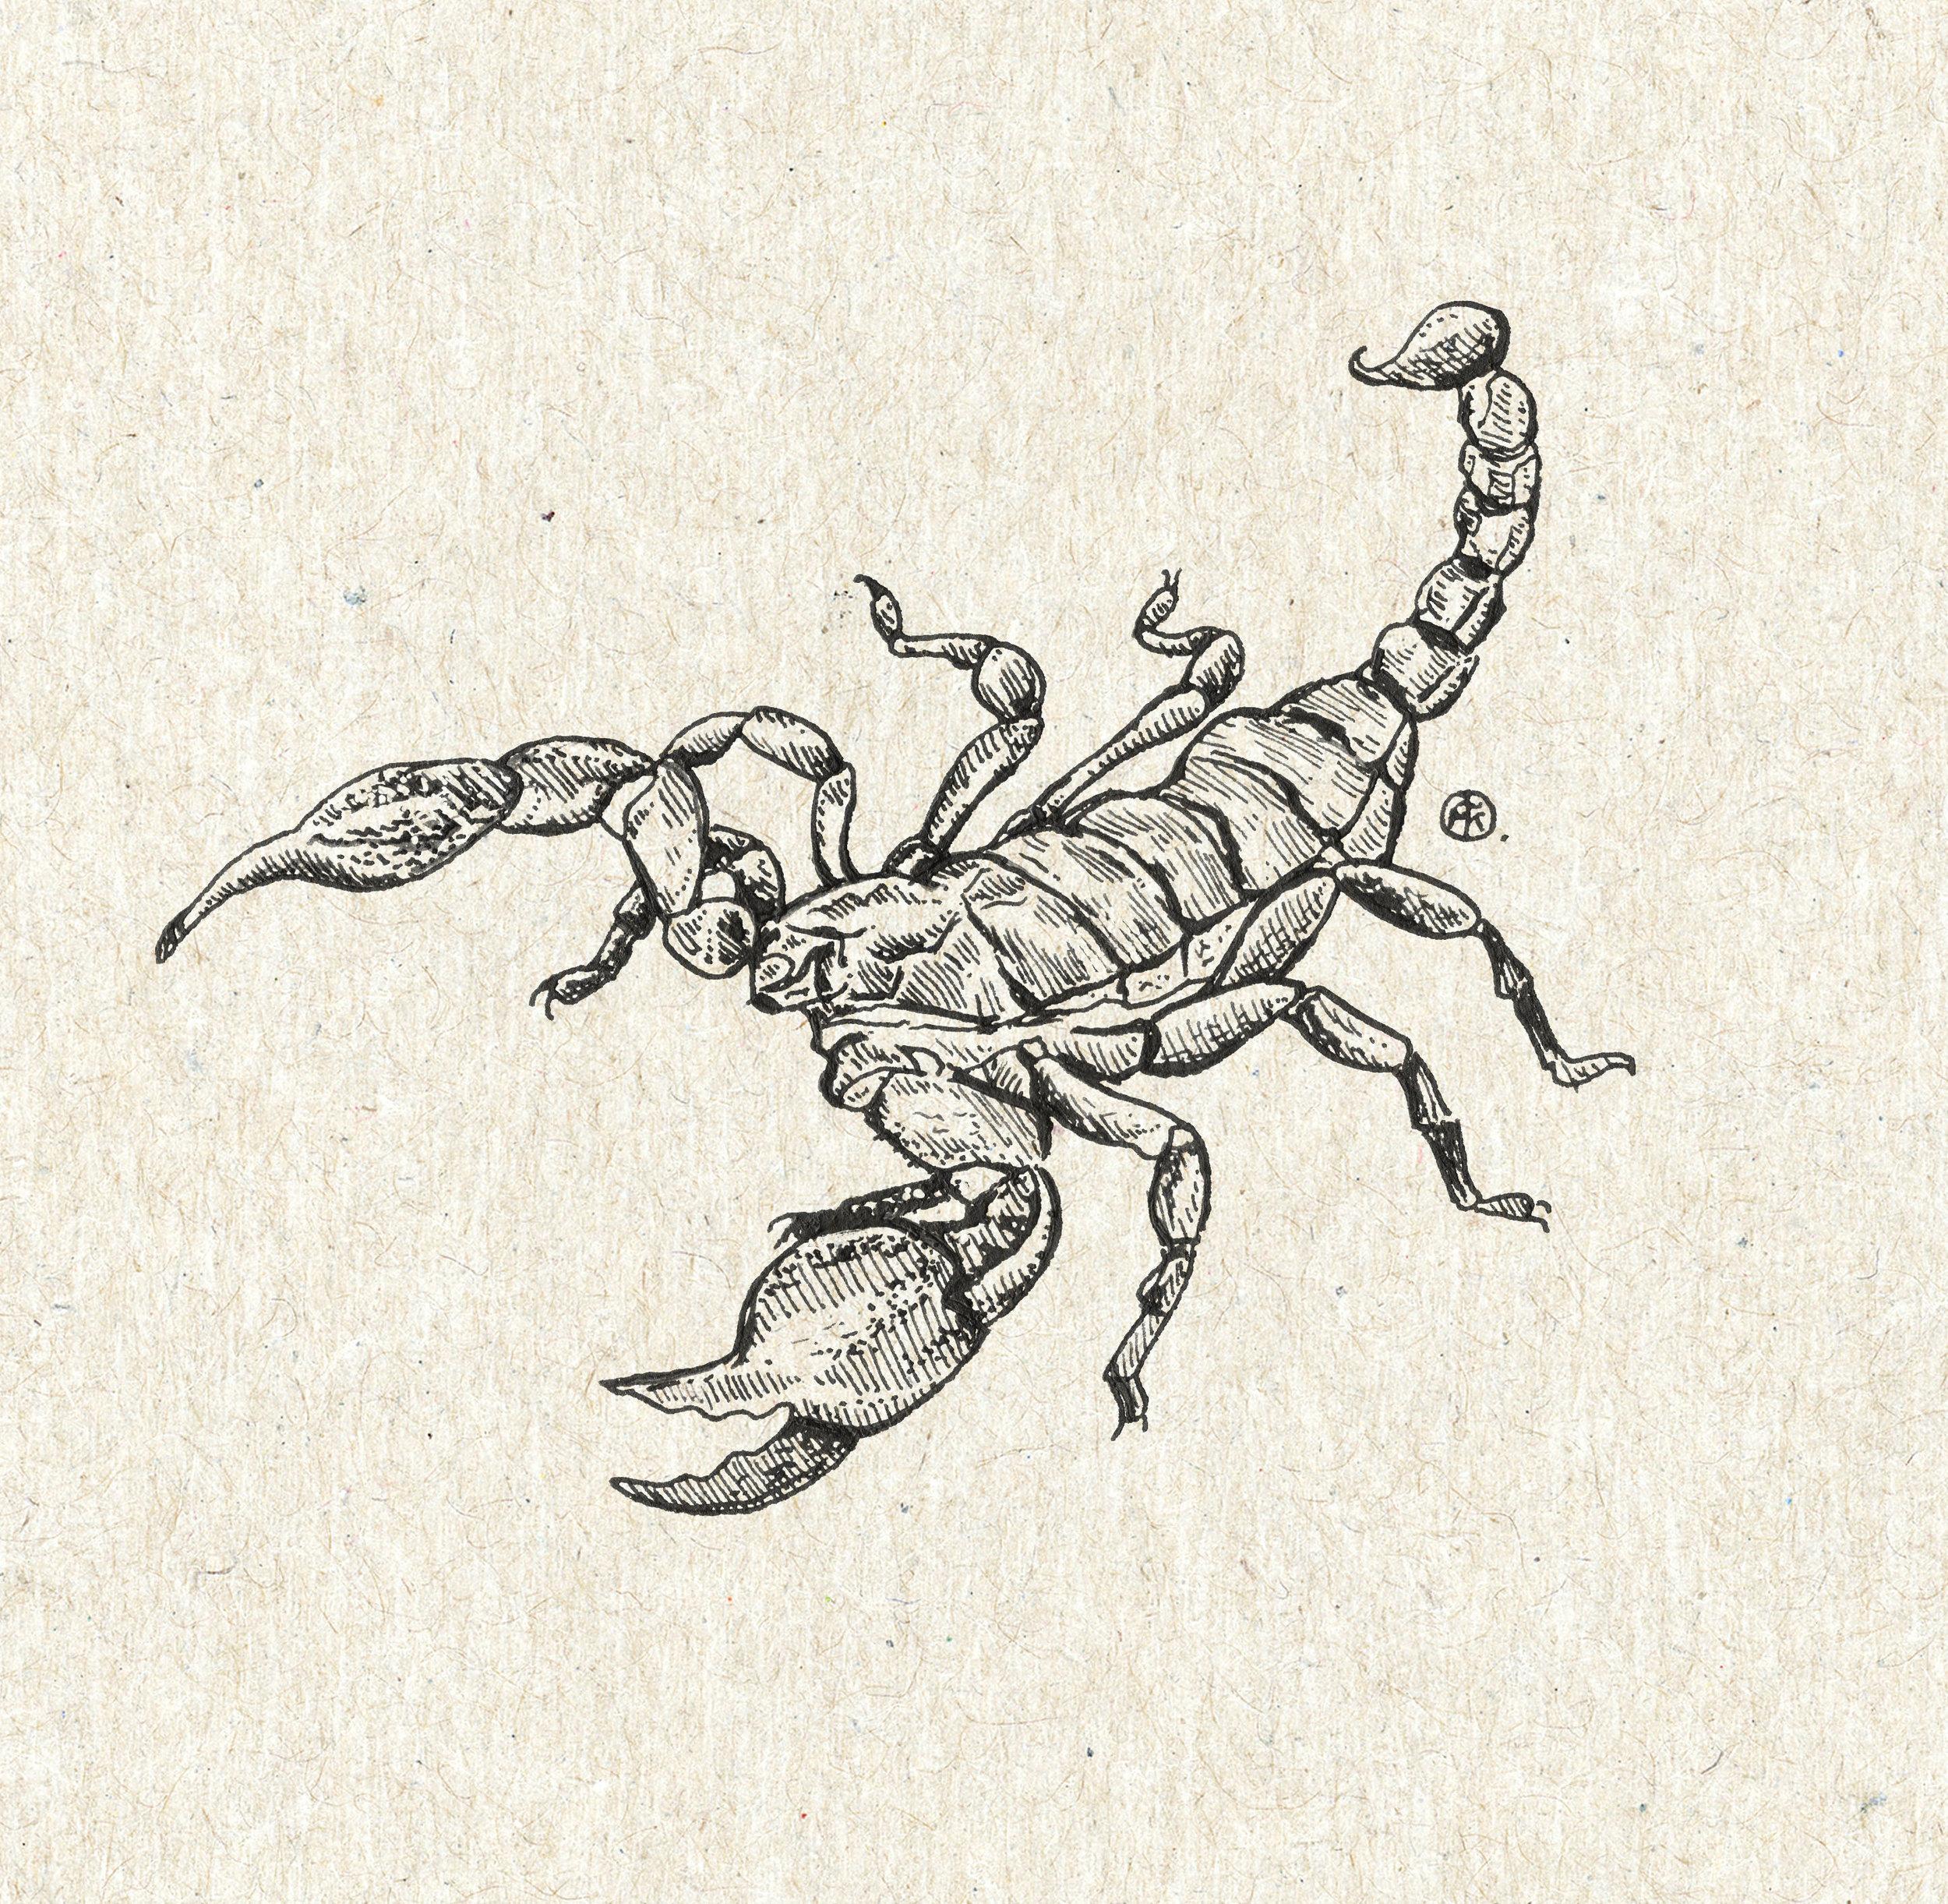 Scorpion smaller.jpg